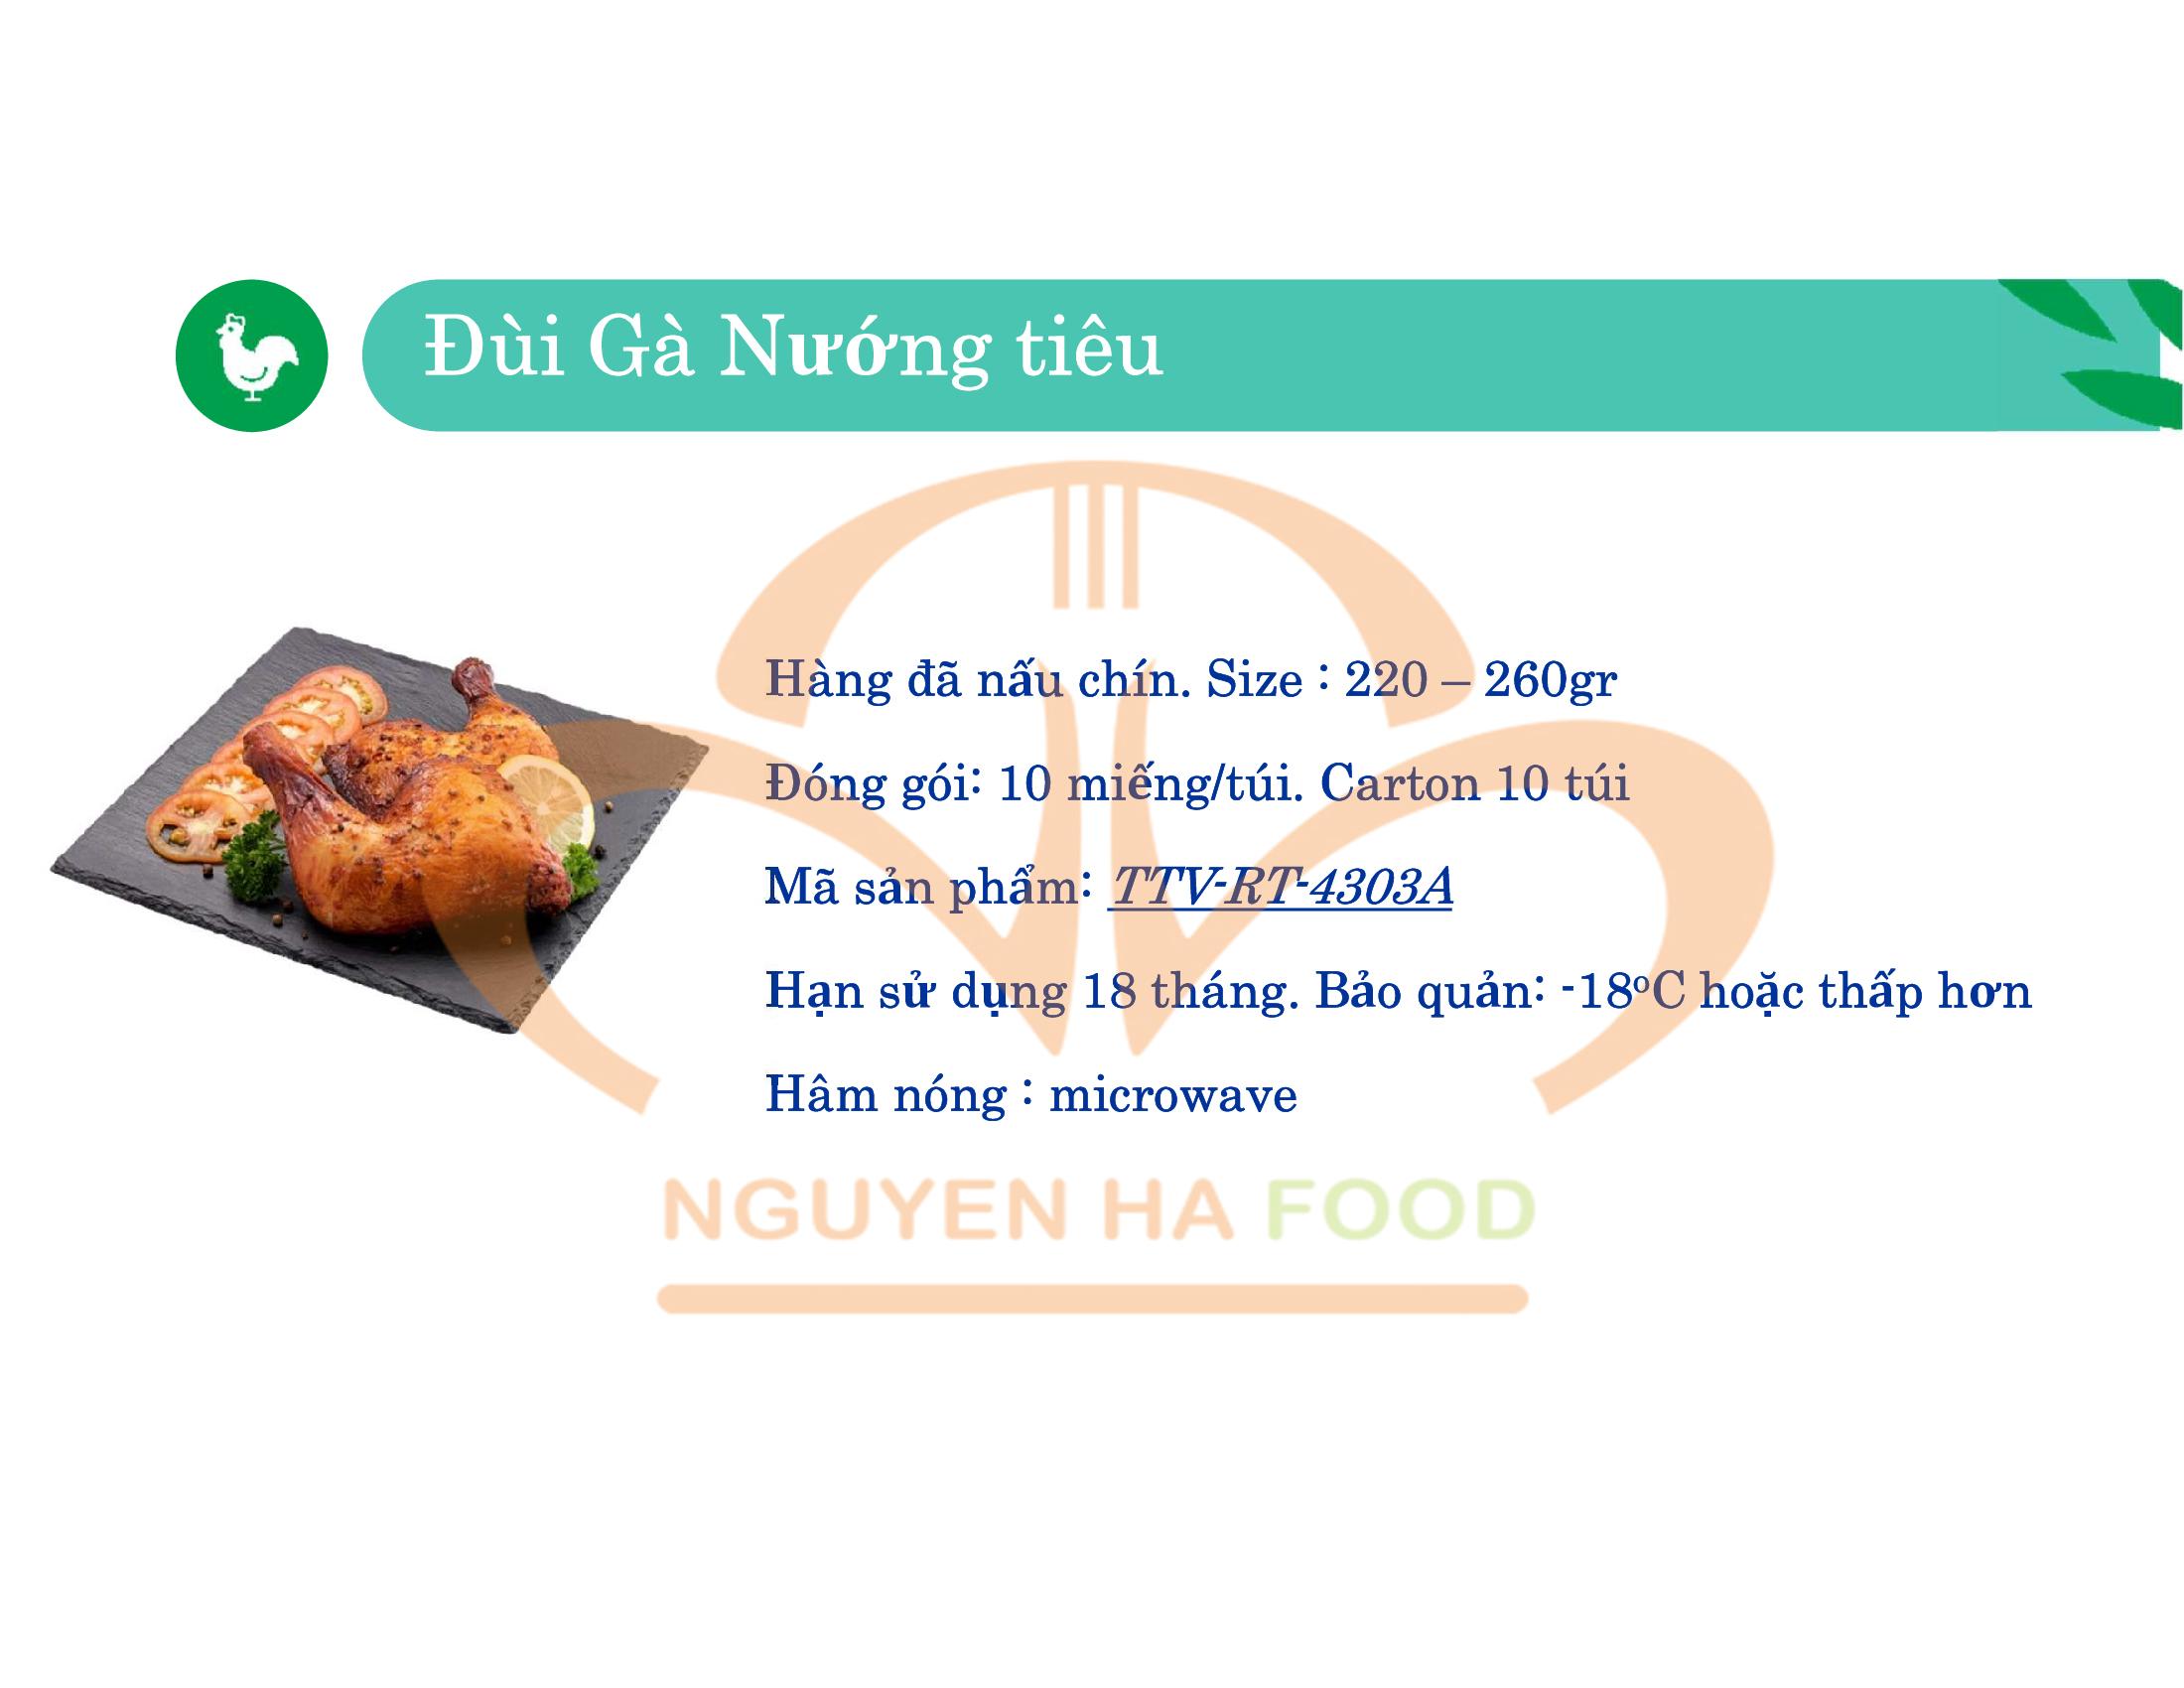 02 DUI GA NUONG TIEU CP NGUYEN HA FOOD